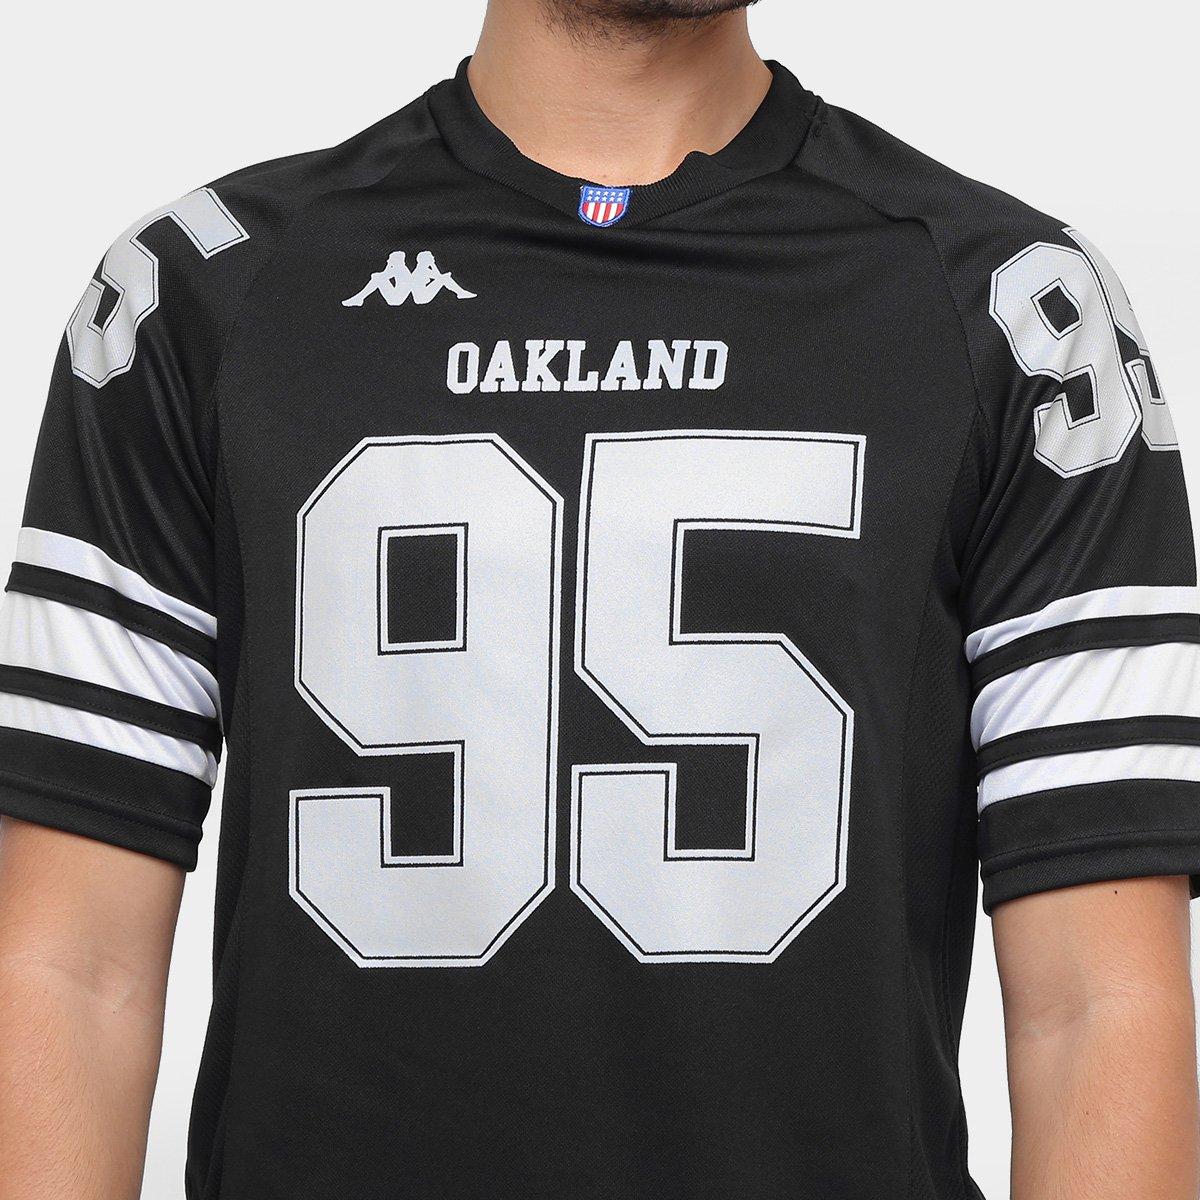 4678bf0fbfeeb Camiseta Oakland Kappa Futebol Americano Masculina - Compre Agora ...